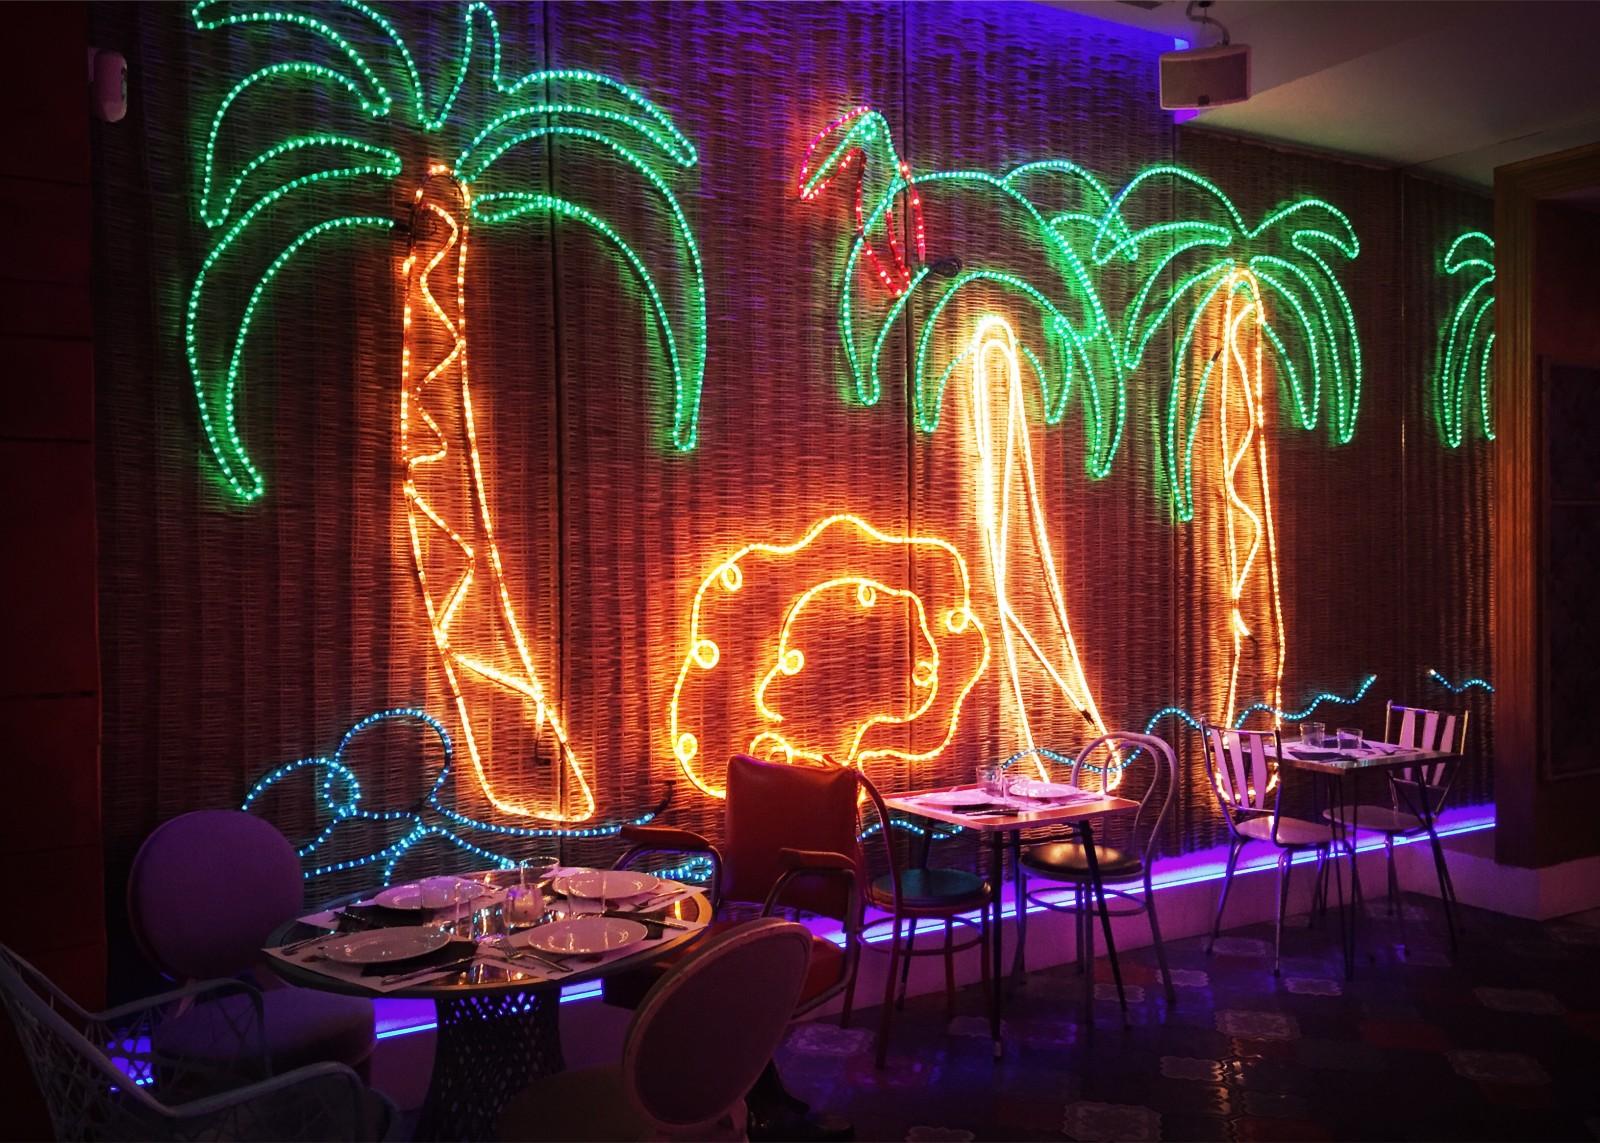 Bananas Club & Restaurant